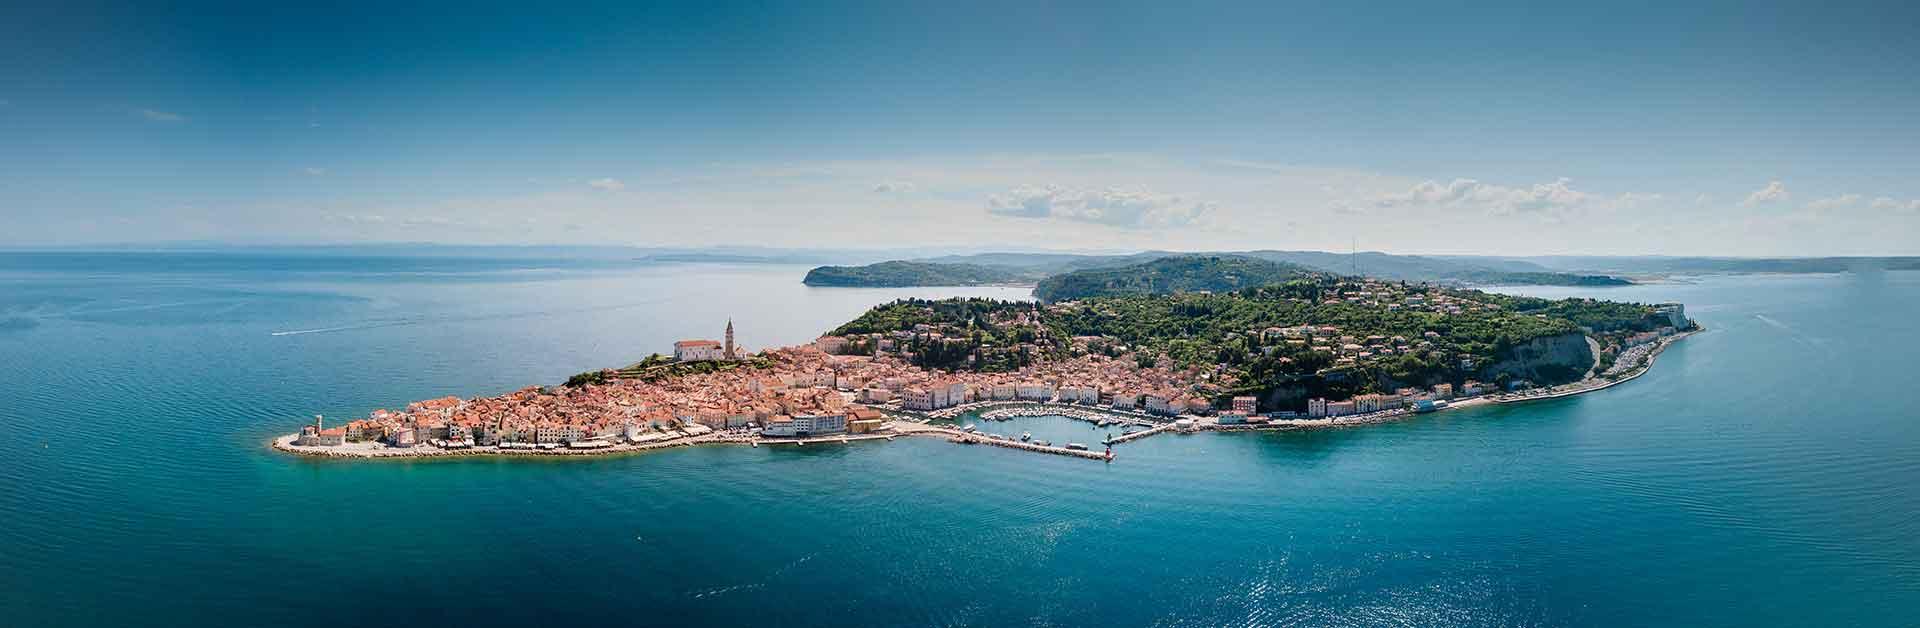 Adriatic views